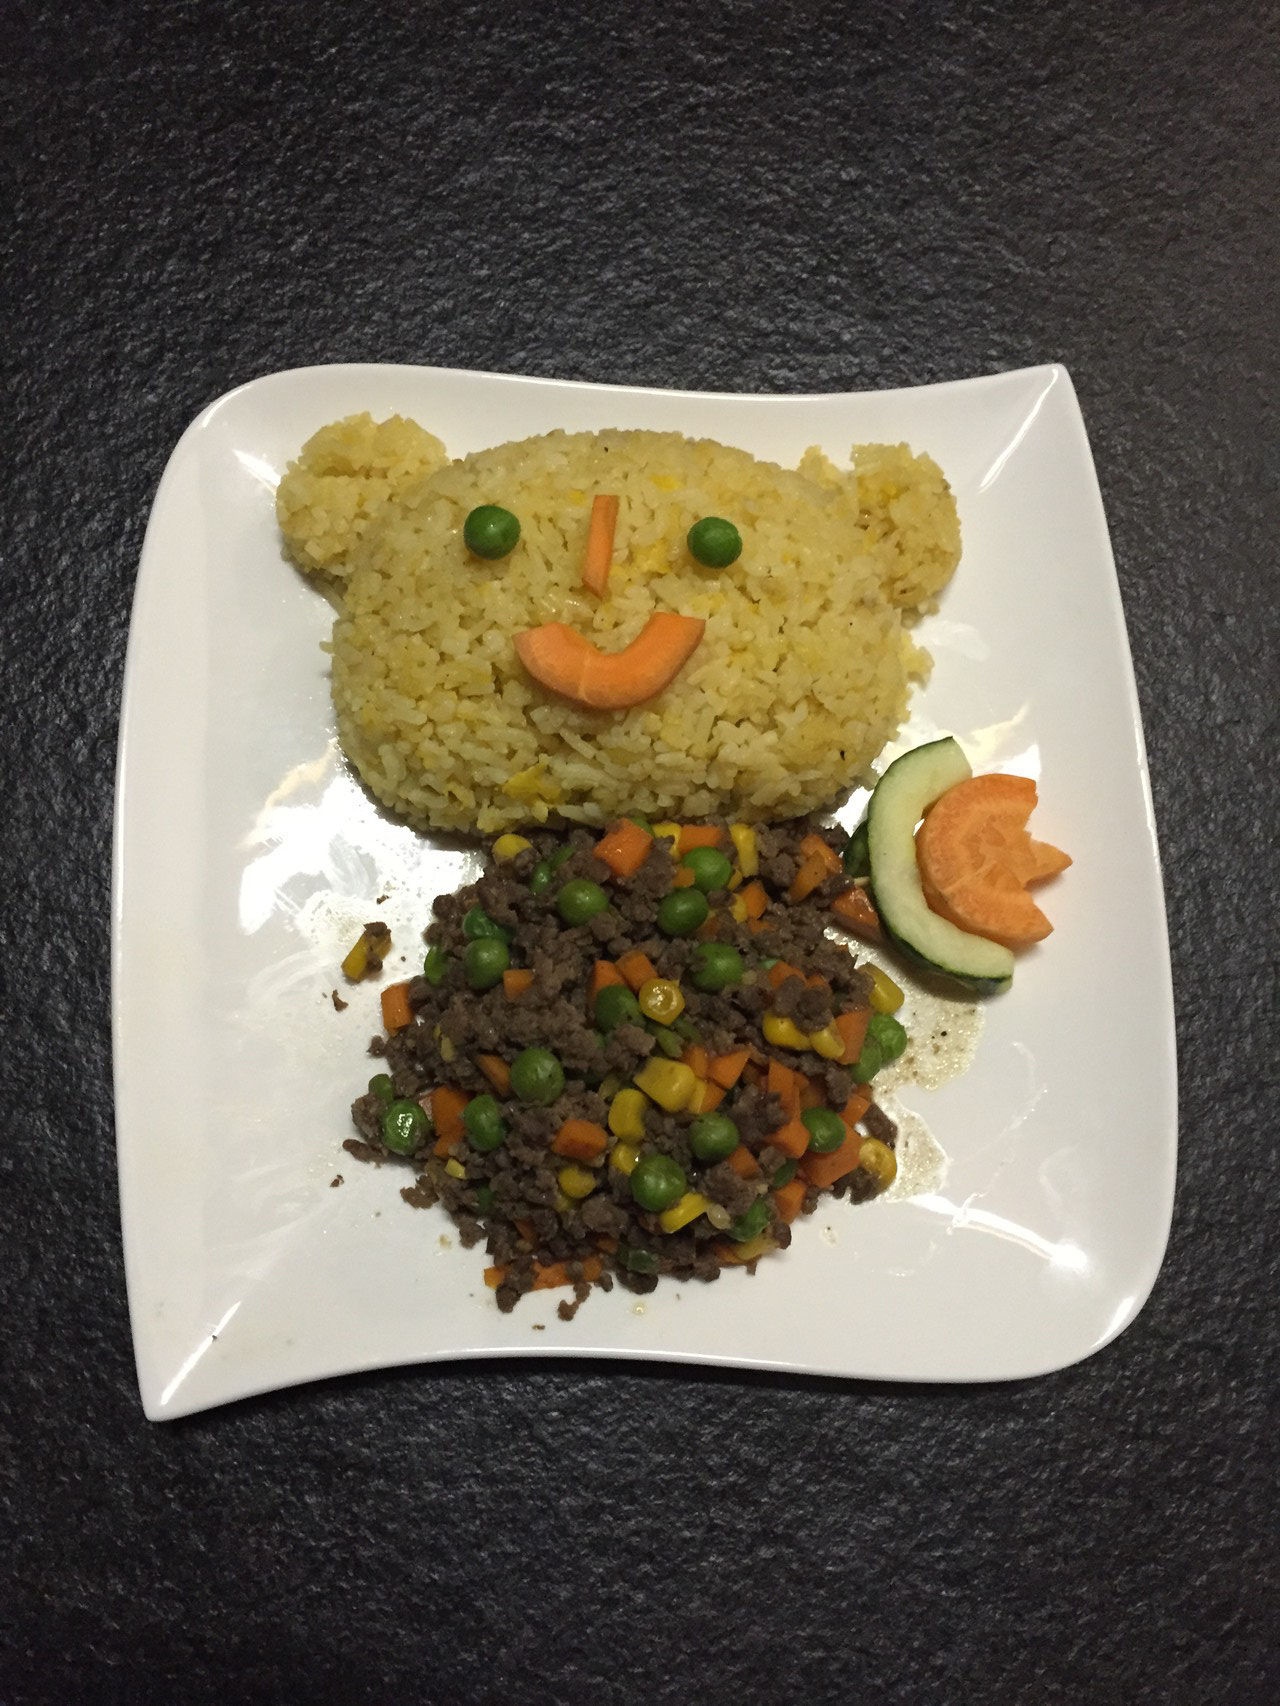 Kinder menu 1 - Gehackt Riindfleisch, Ebsen , Mais, Karotten mit gebraten Reis.